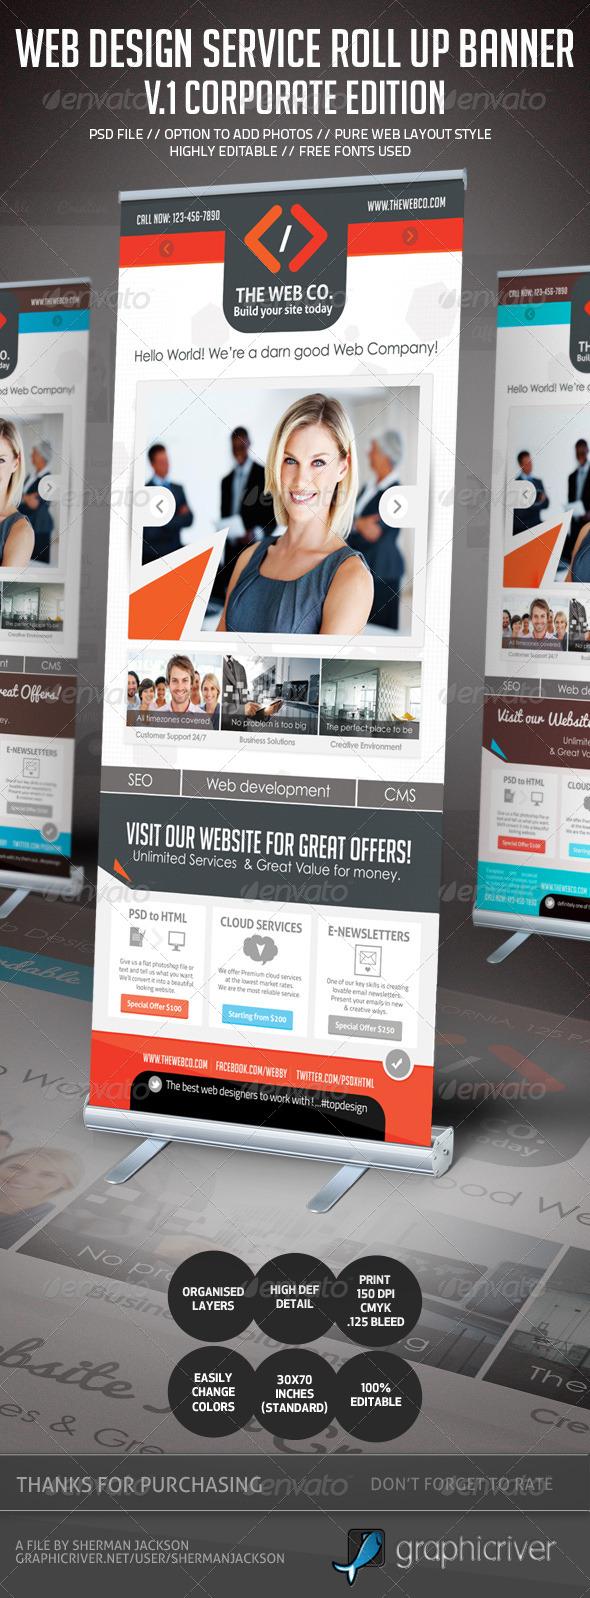 Web Design Service Roll Up Banner Signage - 1 - Signage Print Templates